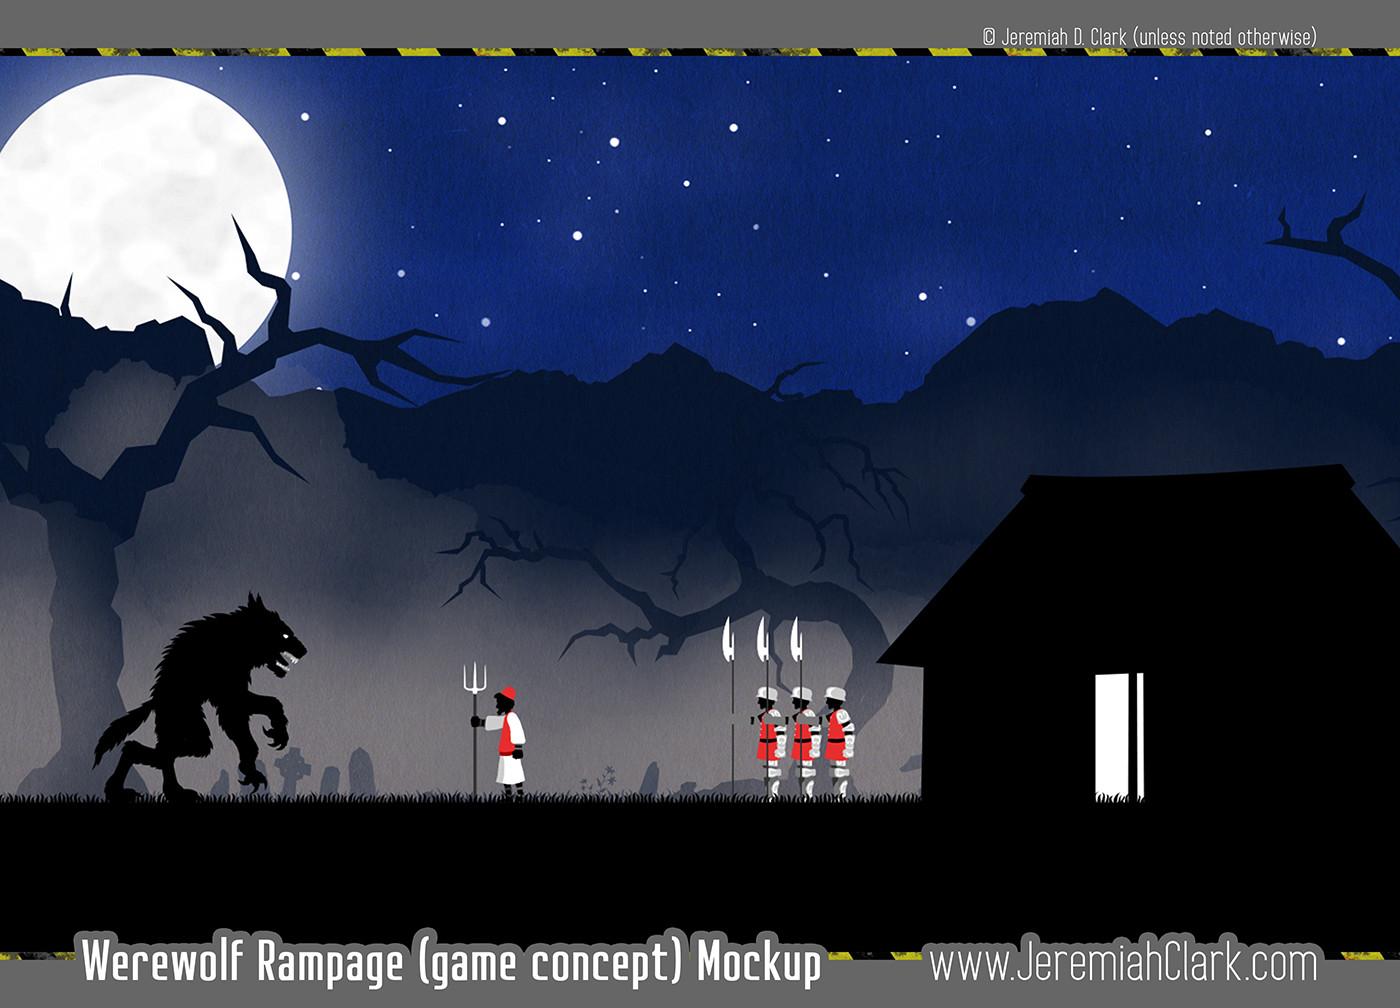 Werewolf Rampage game concept/WIP image. Original designs.